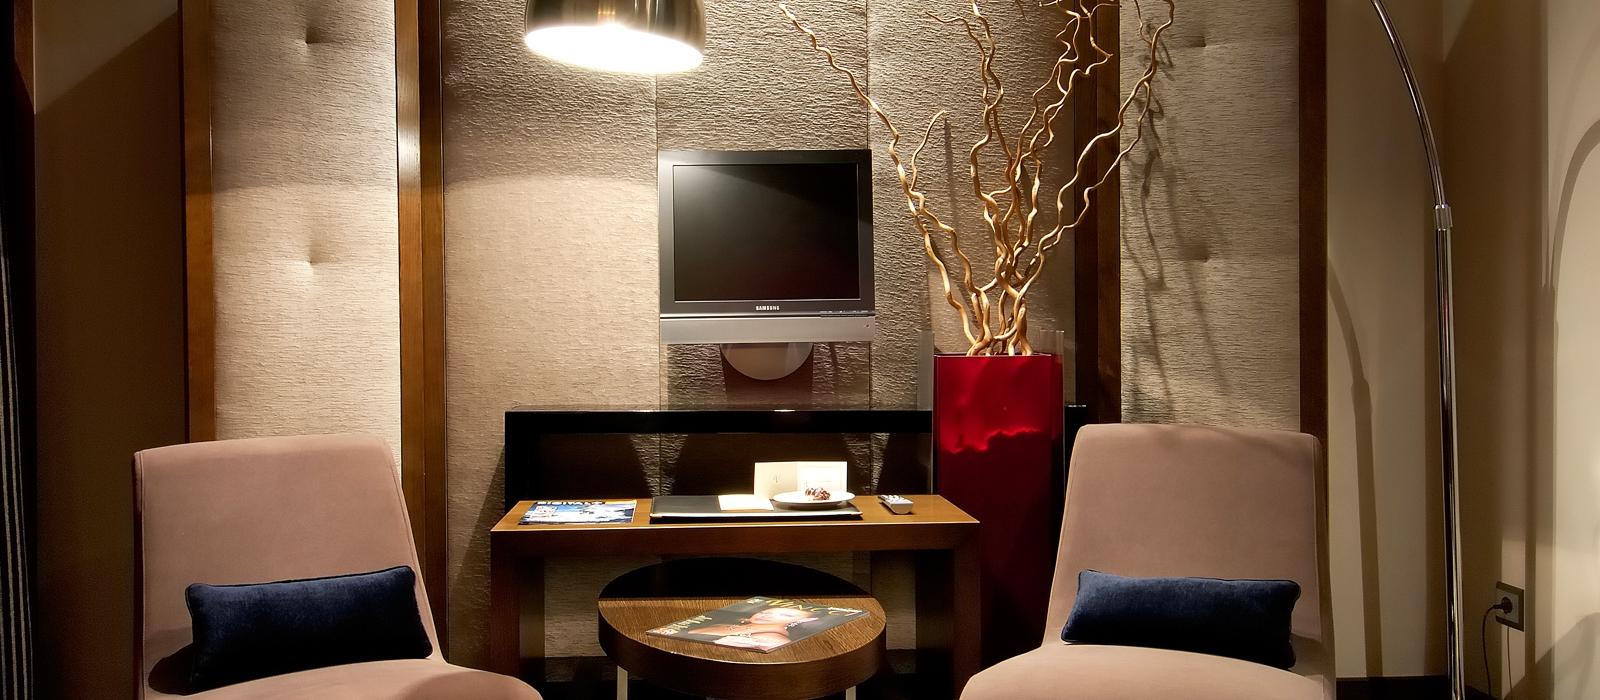 Übernachtung im Hotel Vincci Soho in Madrid - Junior Suite